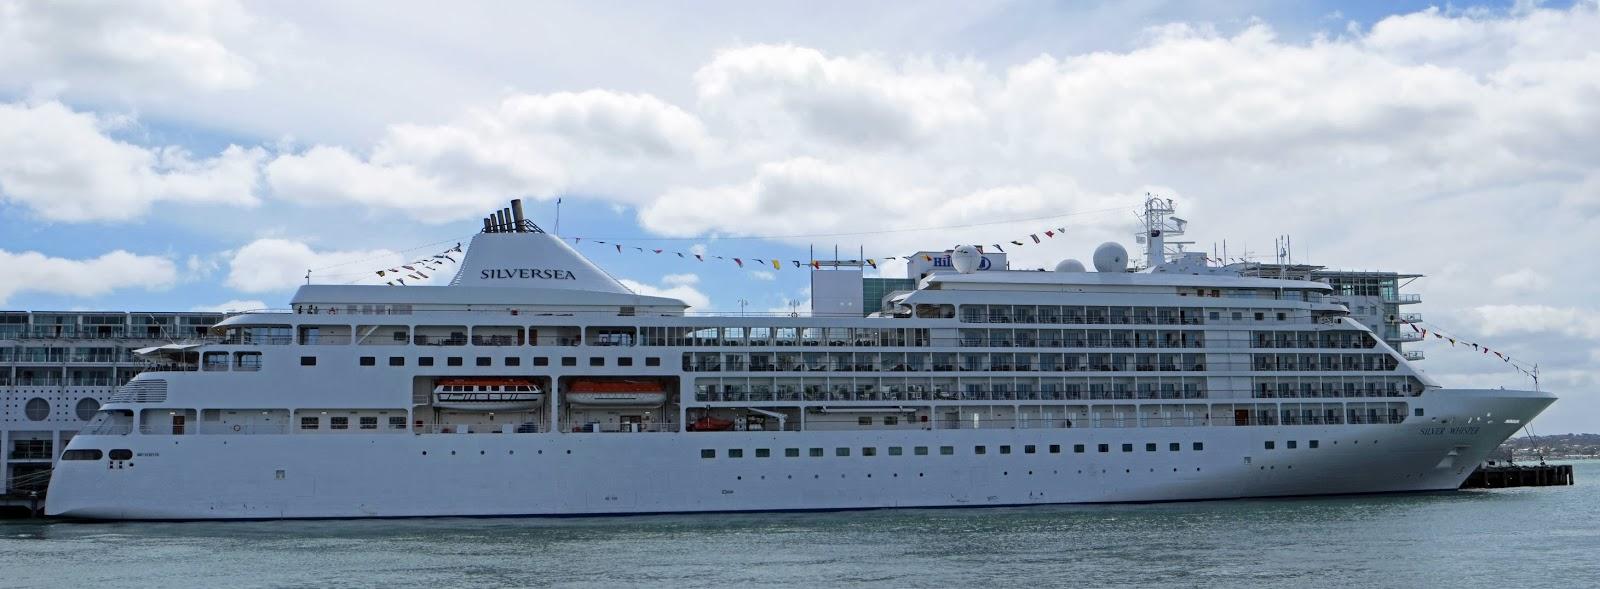 Sconzani Sailing Away Cruise Ships Part Two - Silver shadow cruise ship itinerary